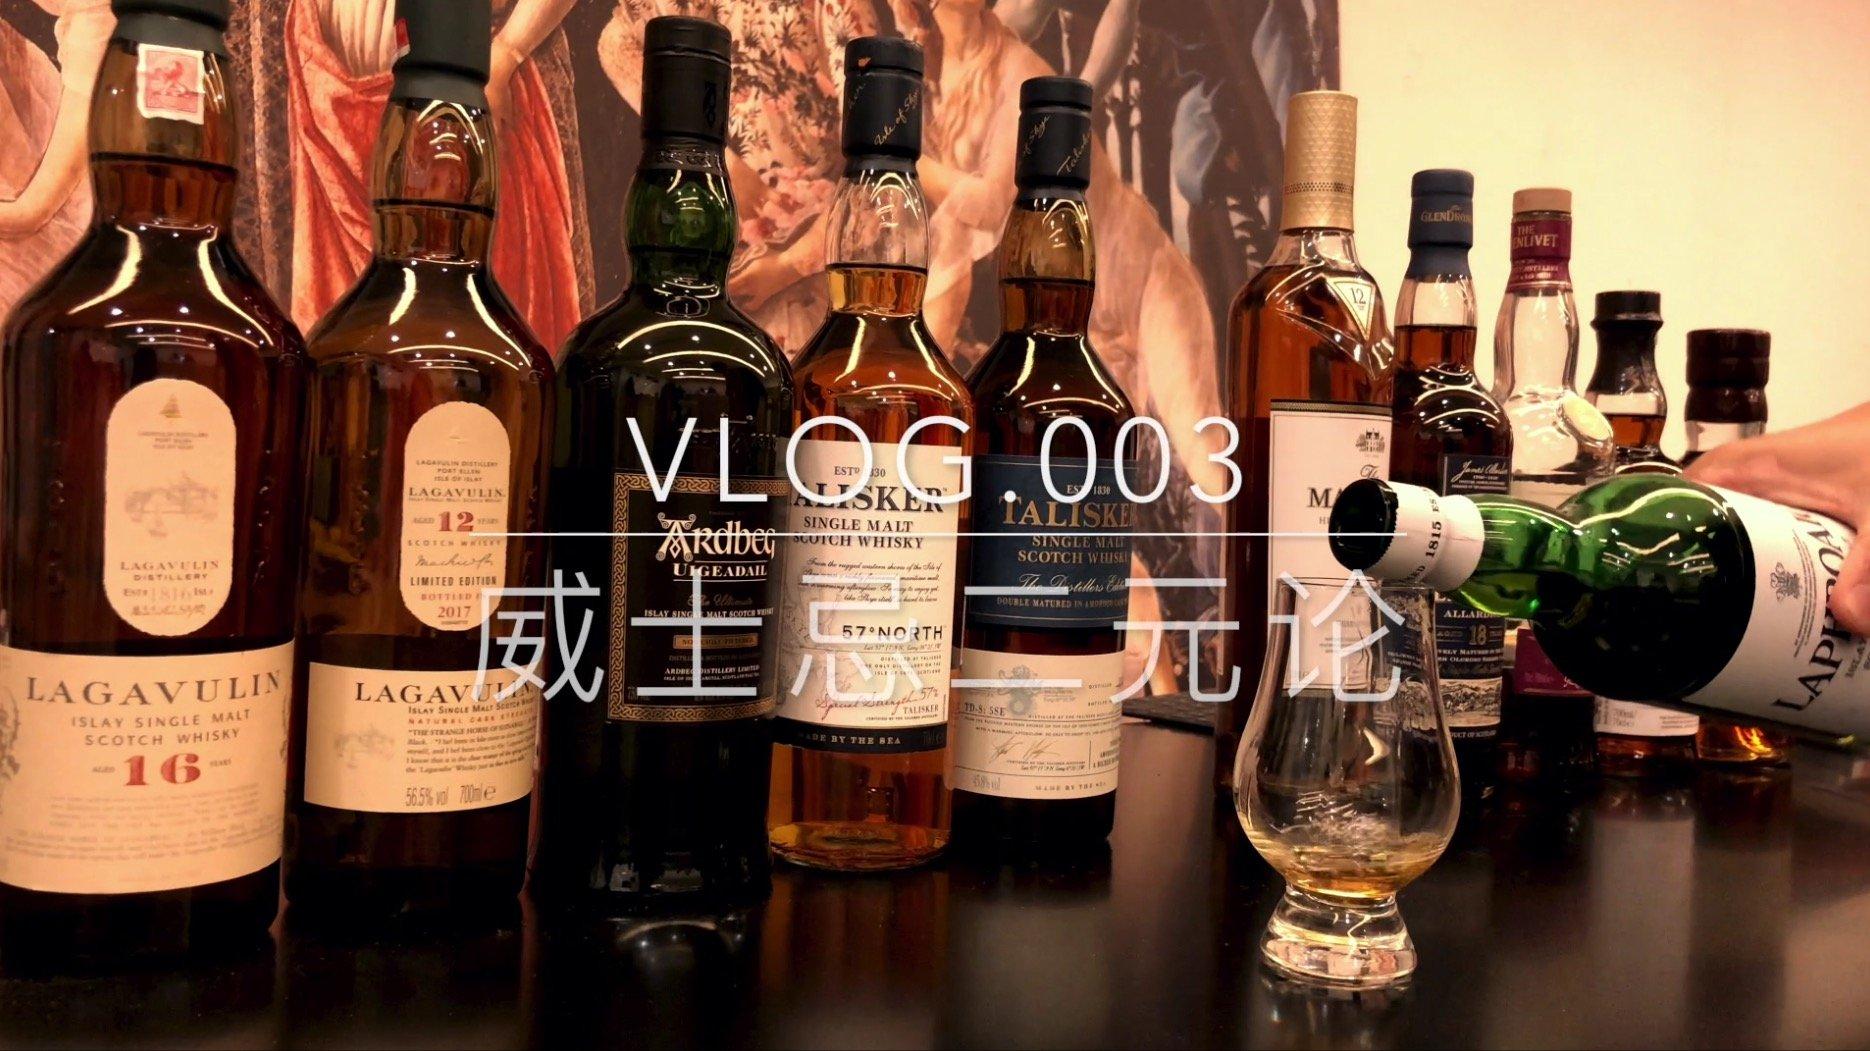 VLOG.003 威士忌二元论,雪莉VS泥煤,一些威士忌推荐